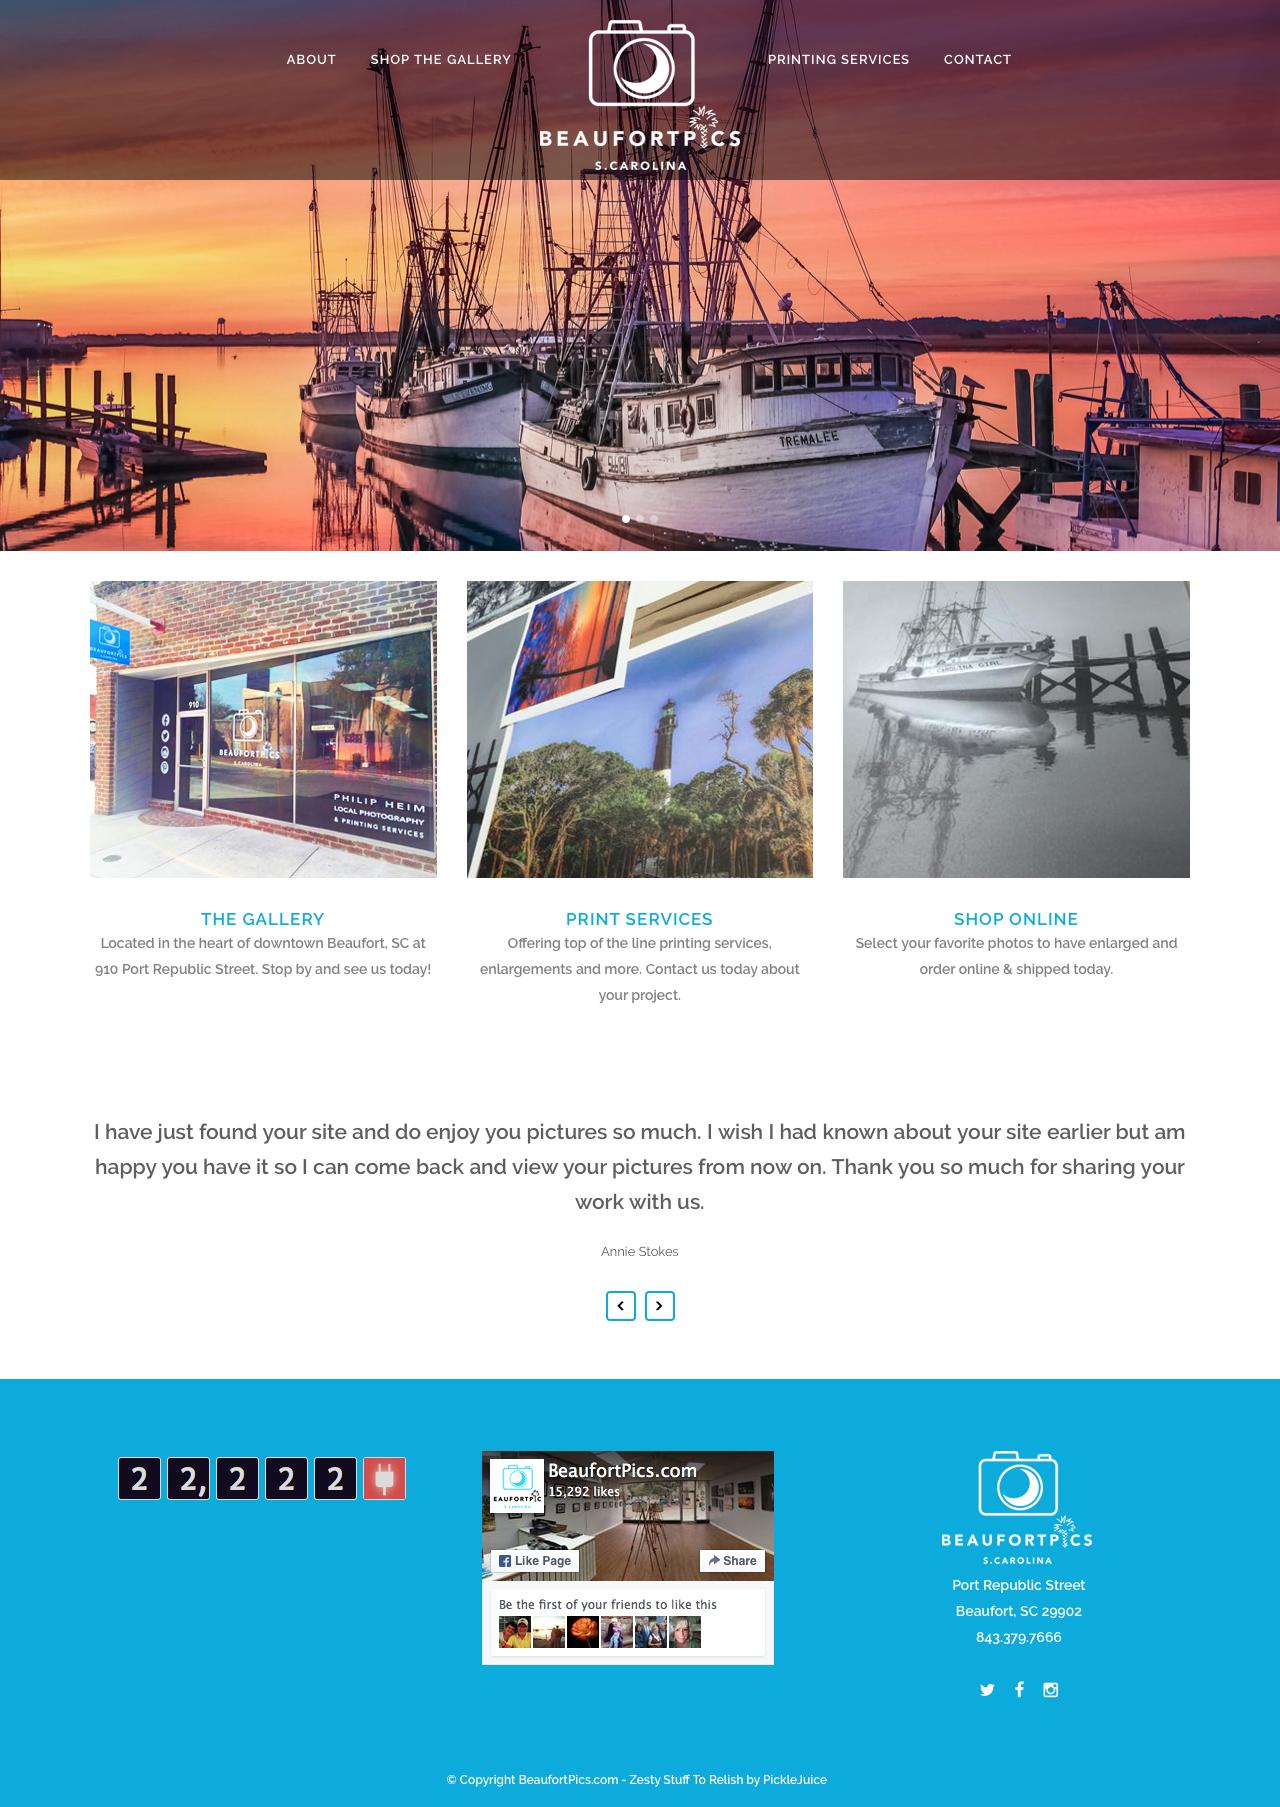 Beaufort Website Design | BeaufortPics.com | PickleJuice Productions